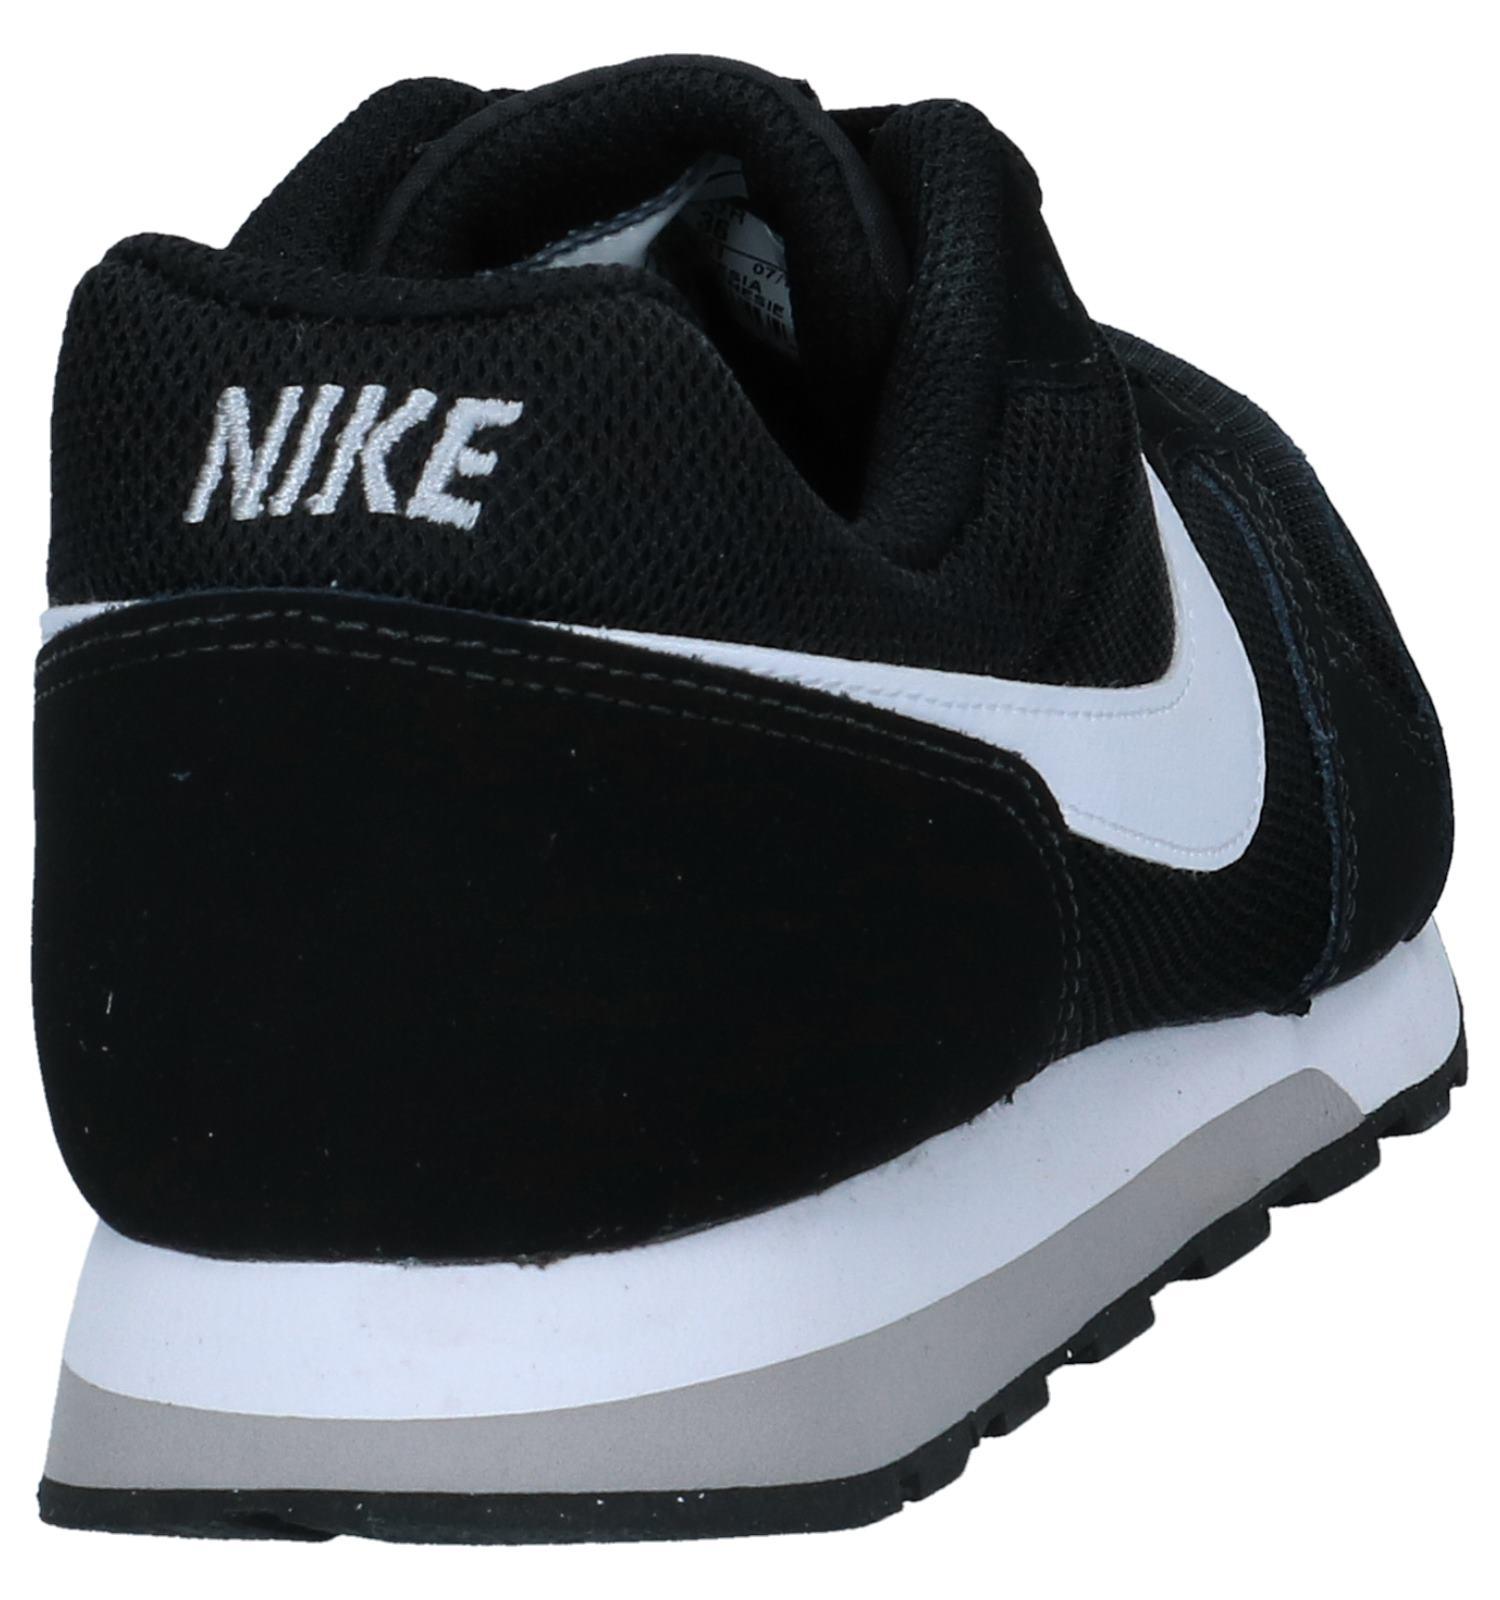 845404b918b Zwarte Lage Sneakers Nike MD Runner | TORFS.BE | Gratis verzend en retour